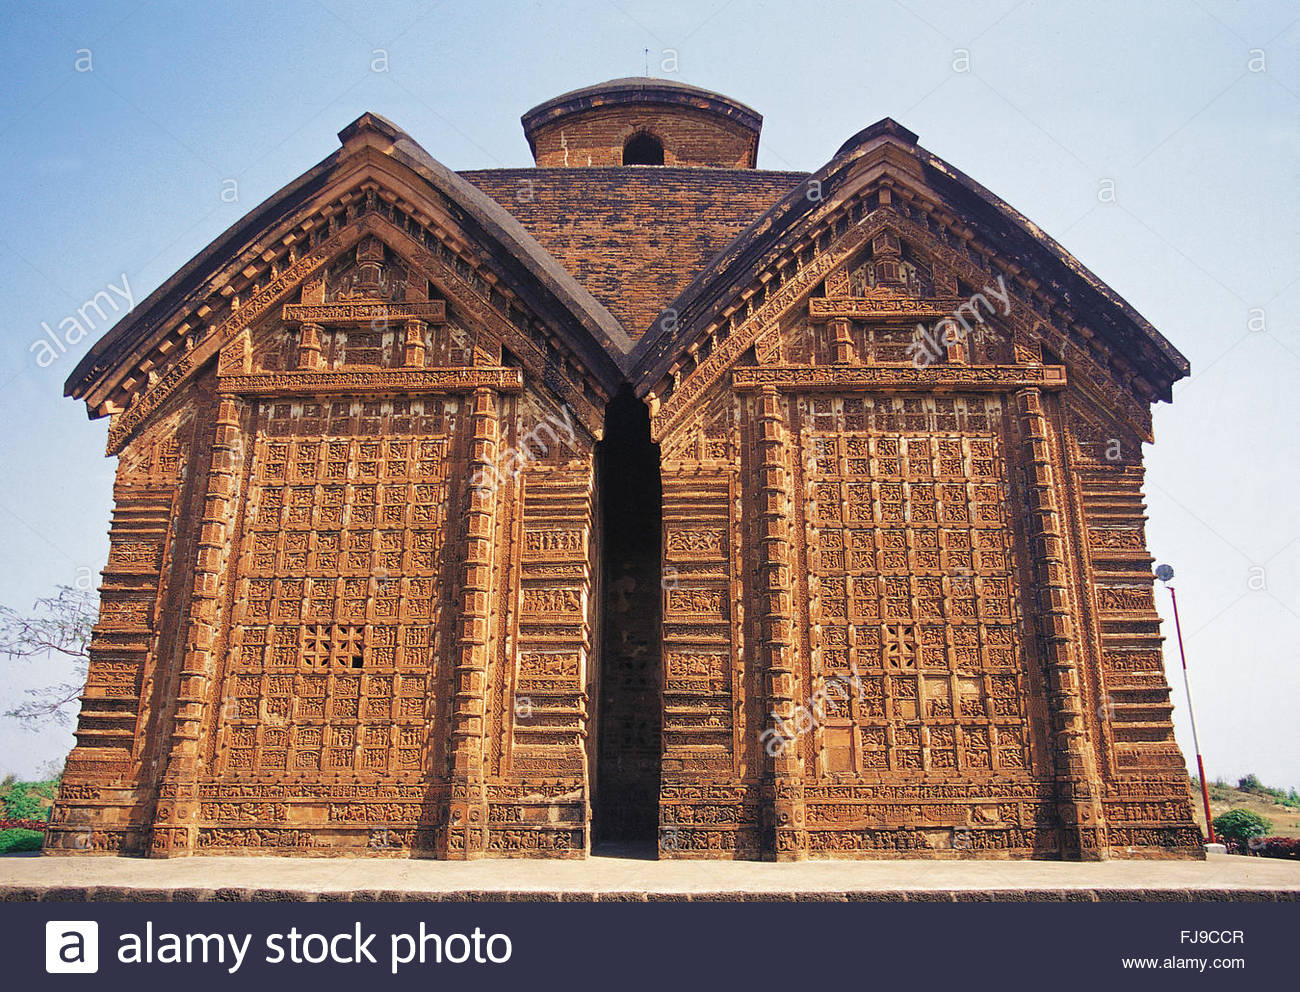 terracotta-temple-bishnupur-west-bengal-